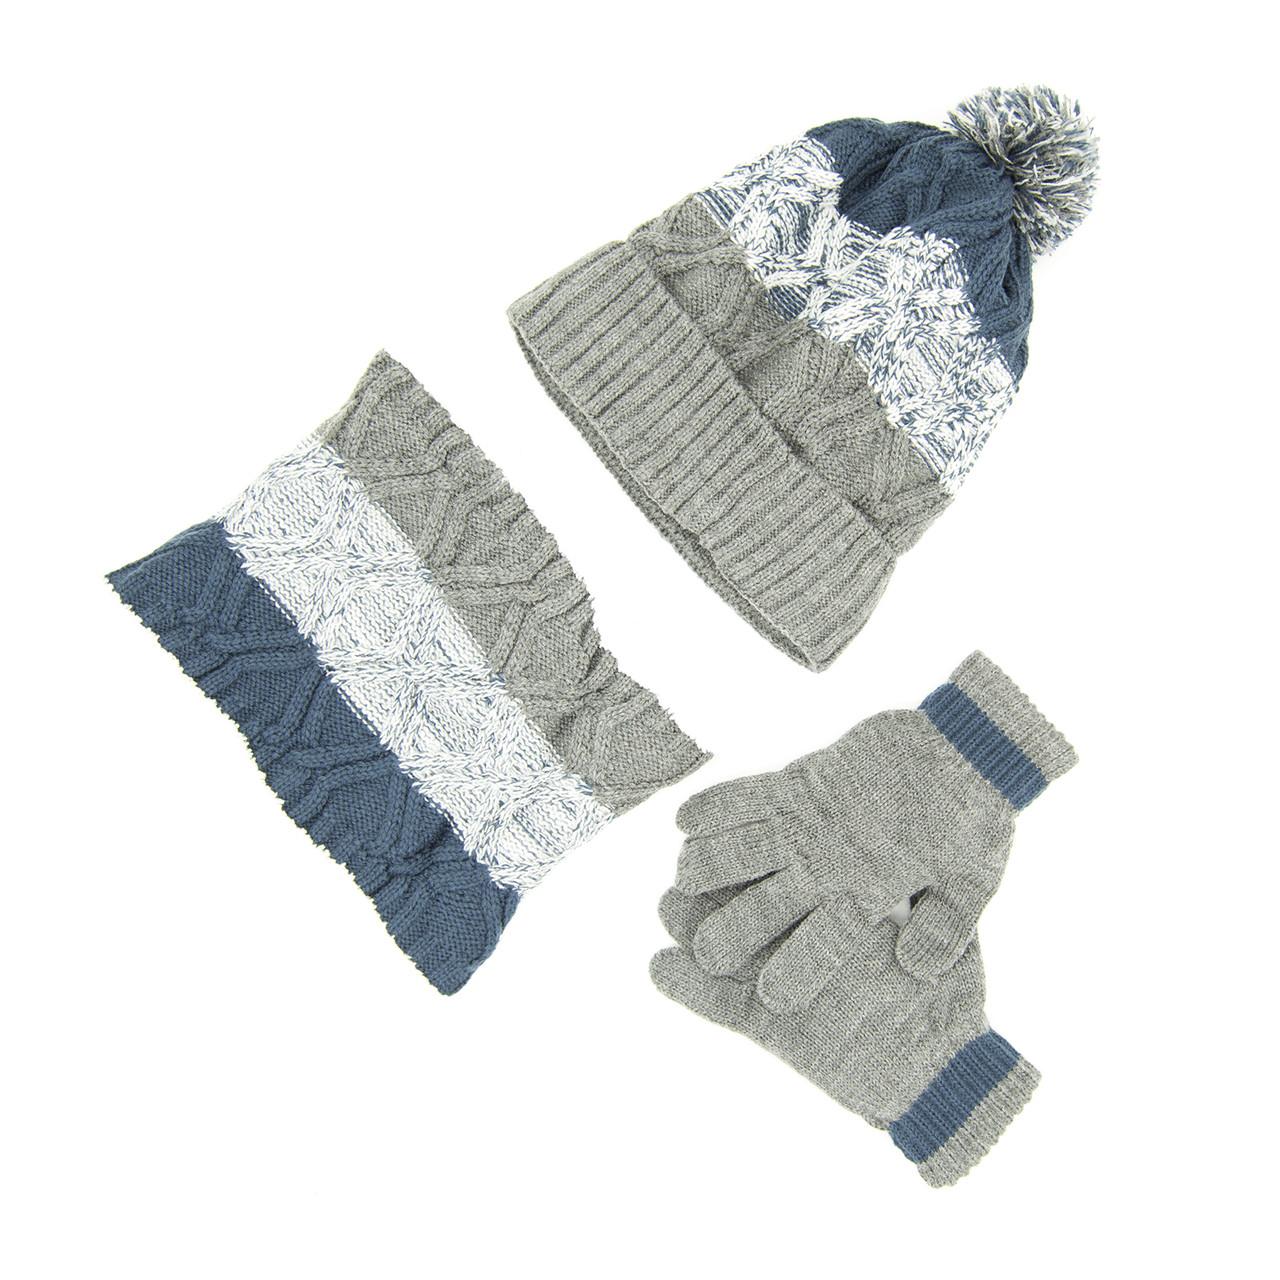 Комплект: шапка, снуд, перчатки Детский 7-12 лет Серый